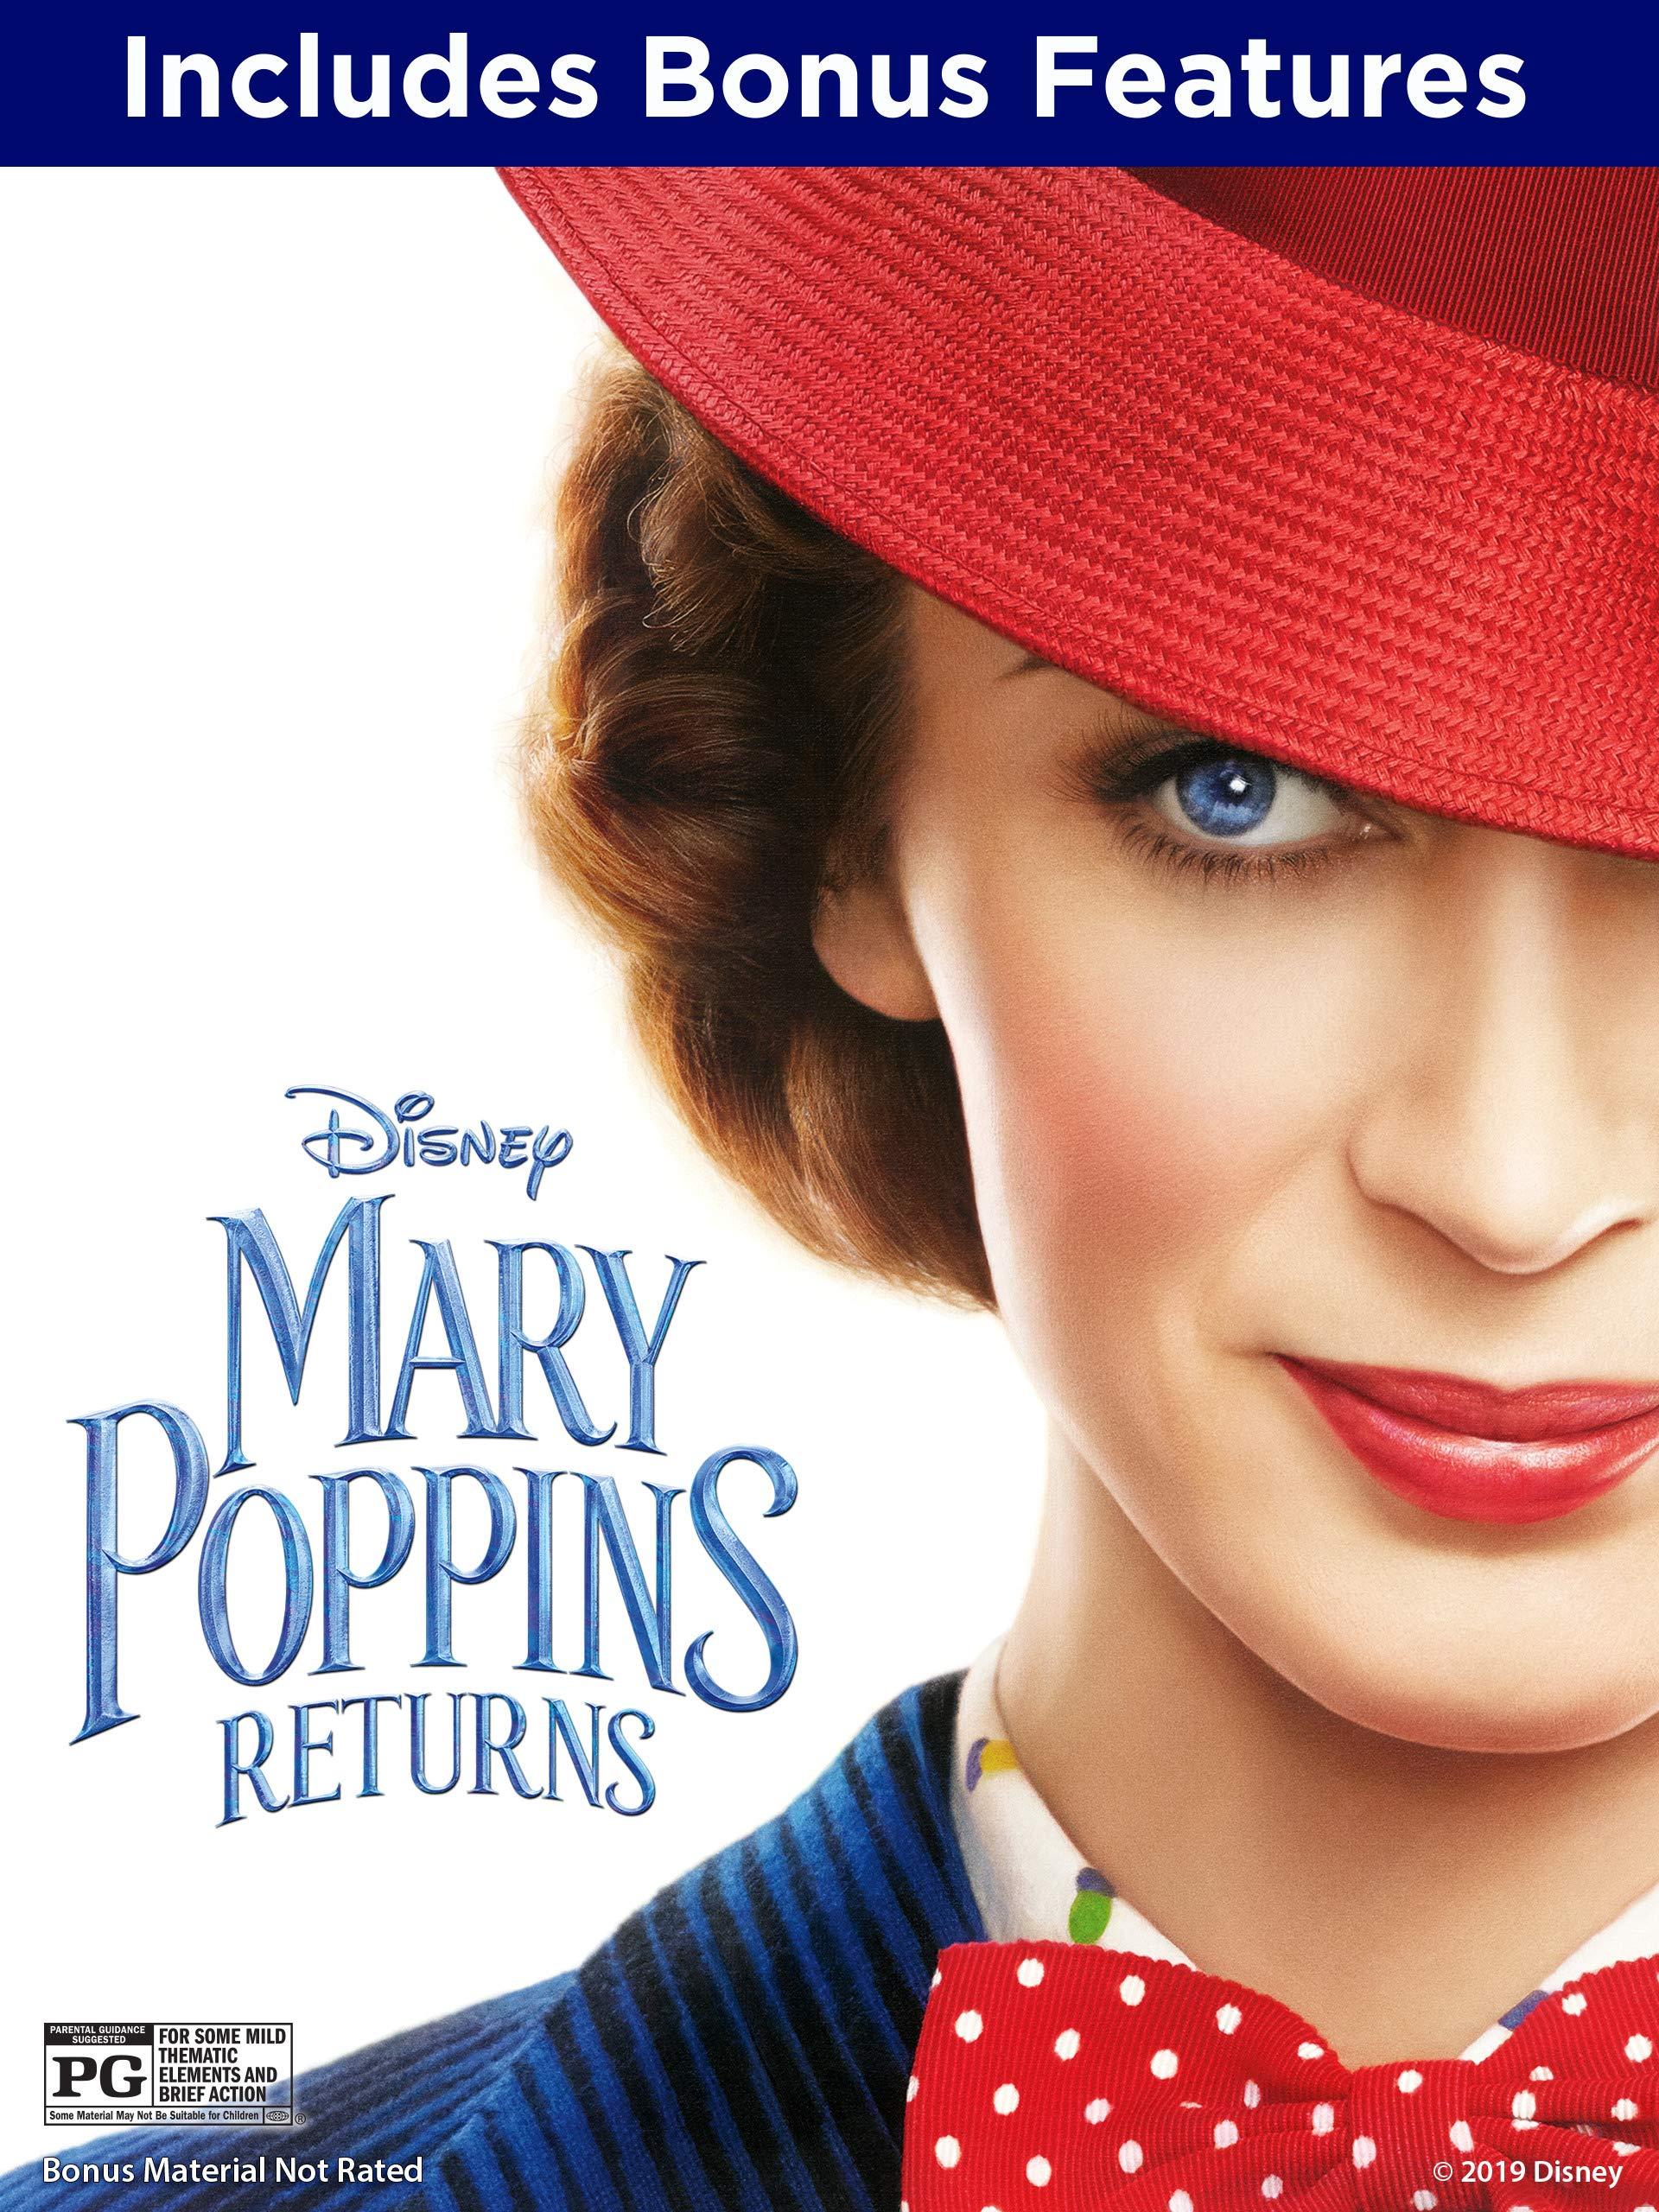 Amazon co uk: Watch Mary Poppins Returns (With Bonus Content